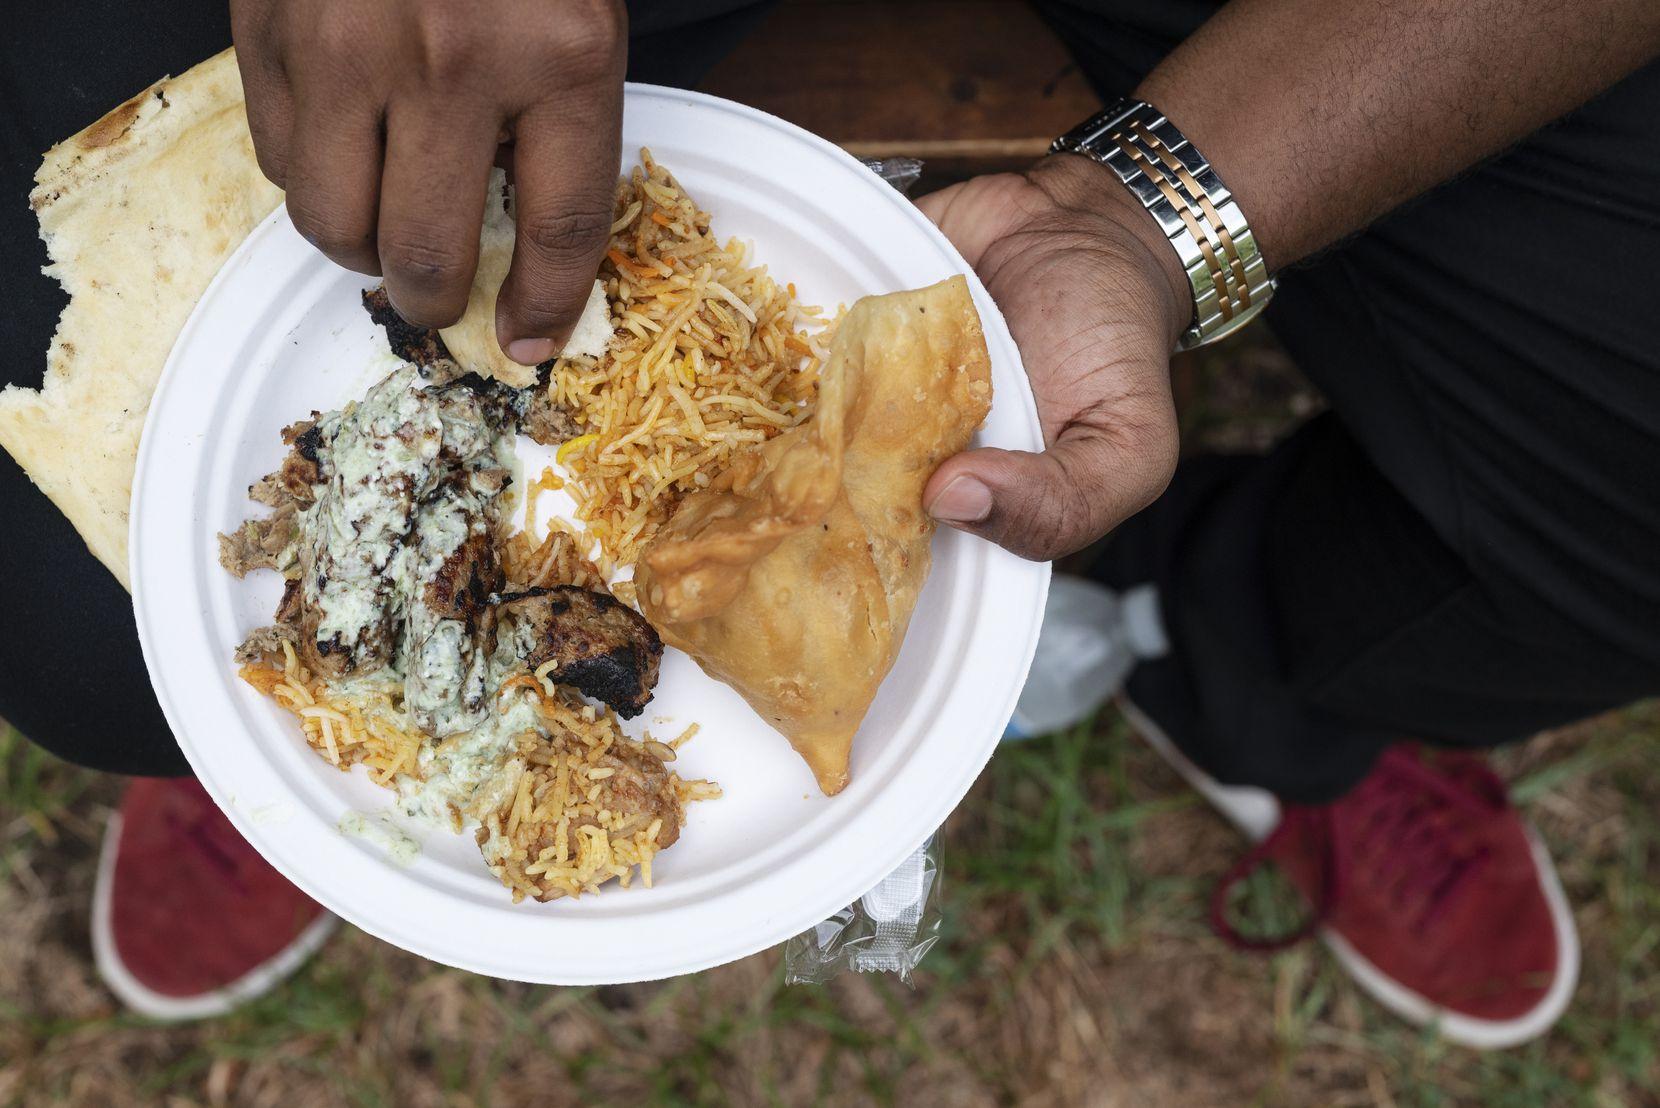 Abdelhalim Awadalla, 28, eats from a plate of Chicken Biryani, Samosa, and Seekh Kebab, during a PunjabiTex BBQ popup, conducted by Chef Usama Khalid.